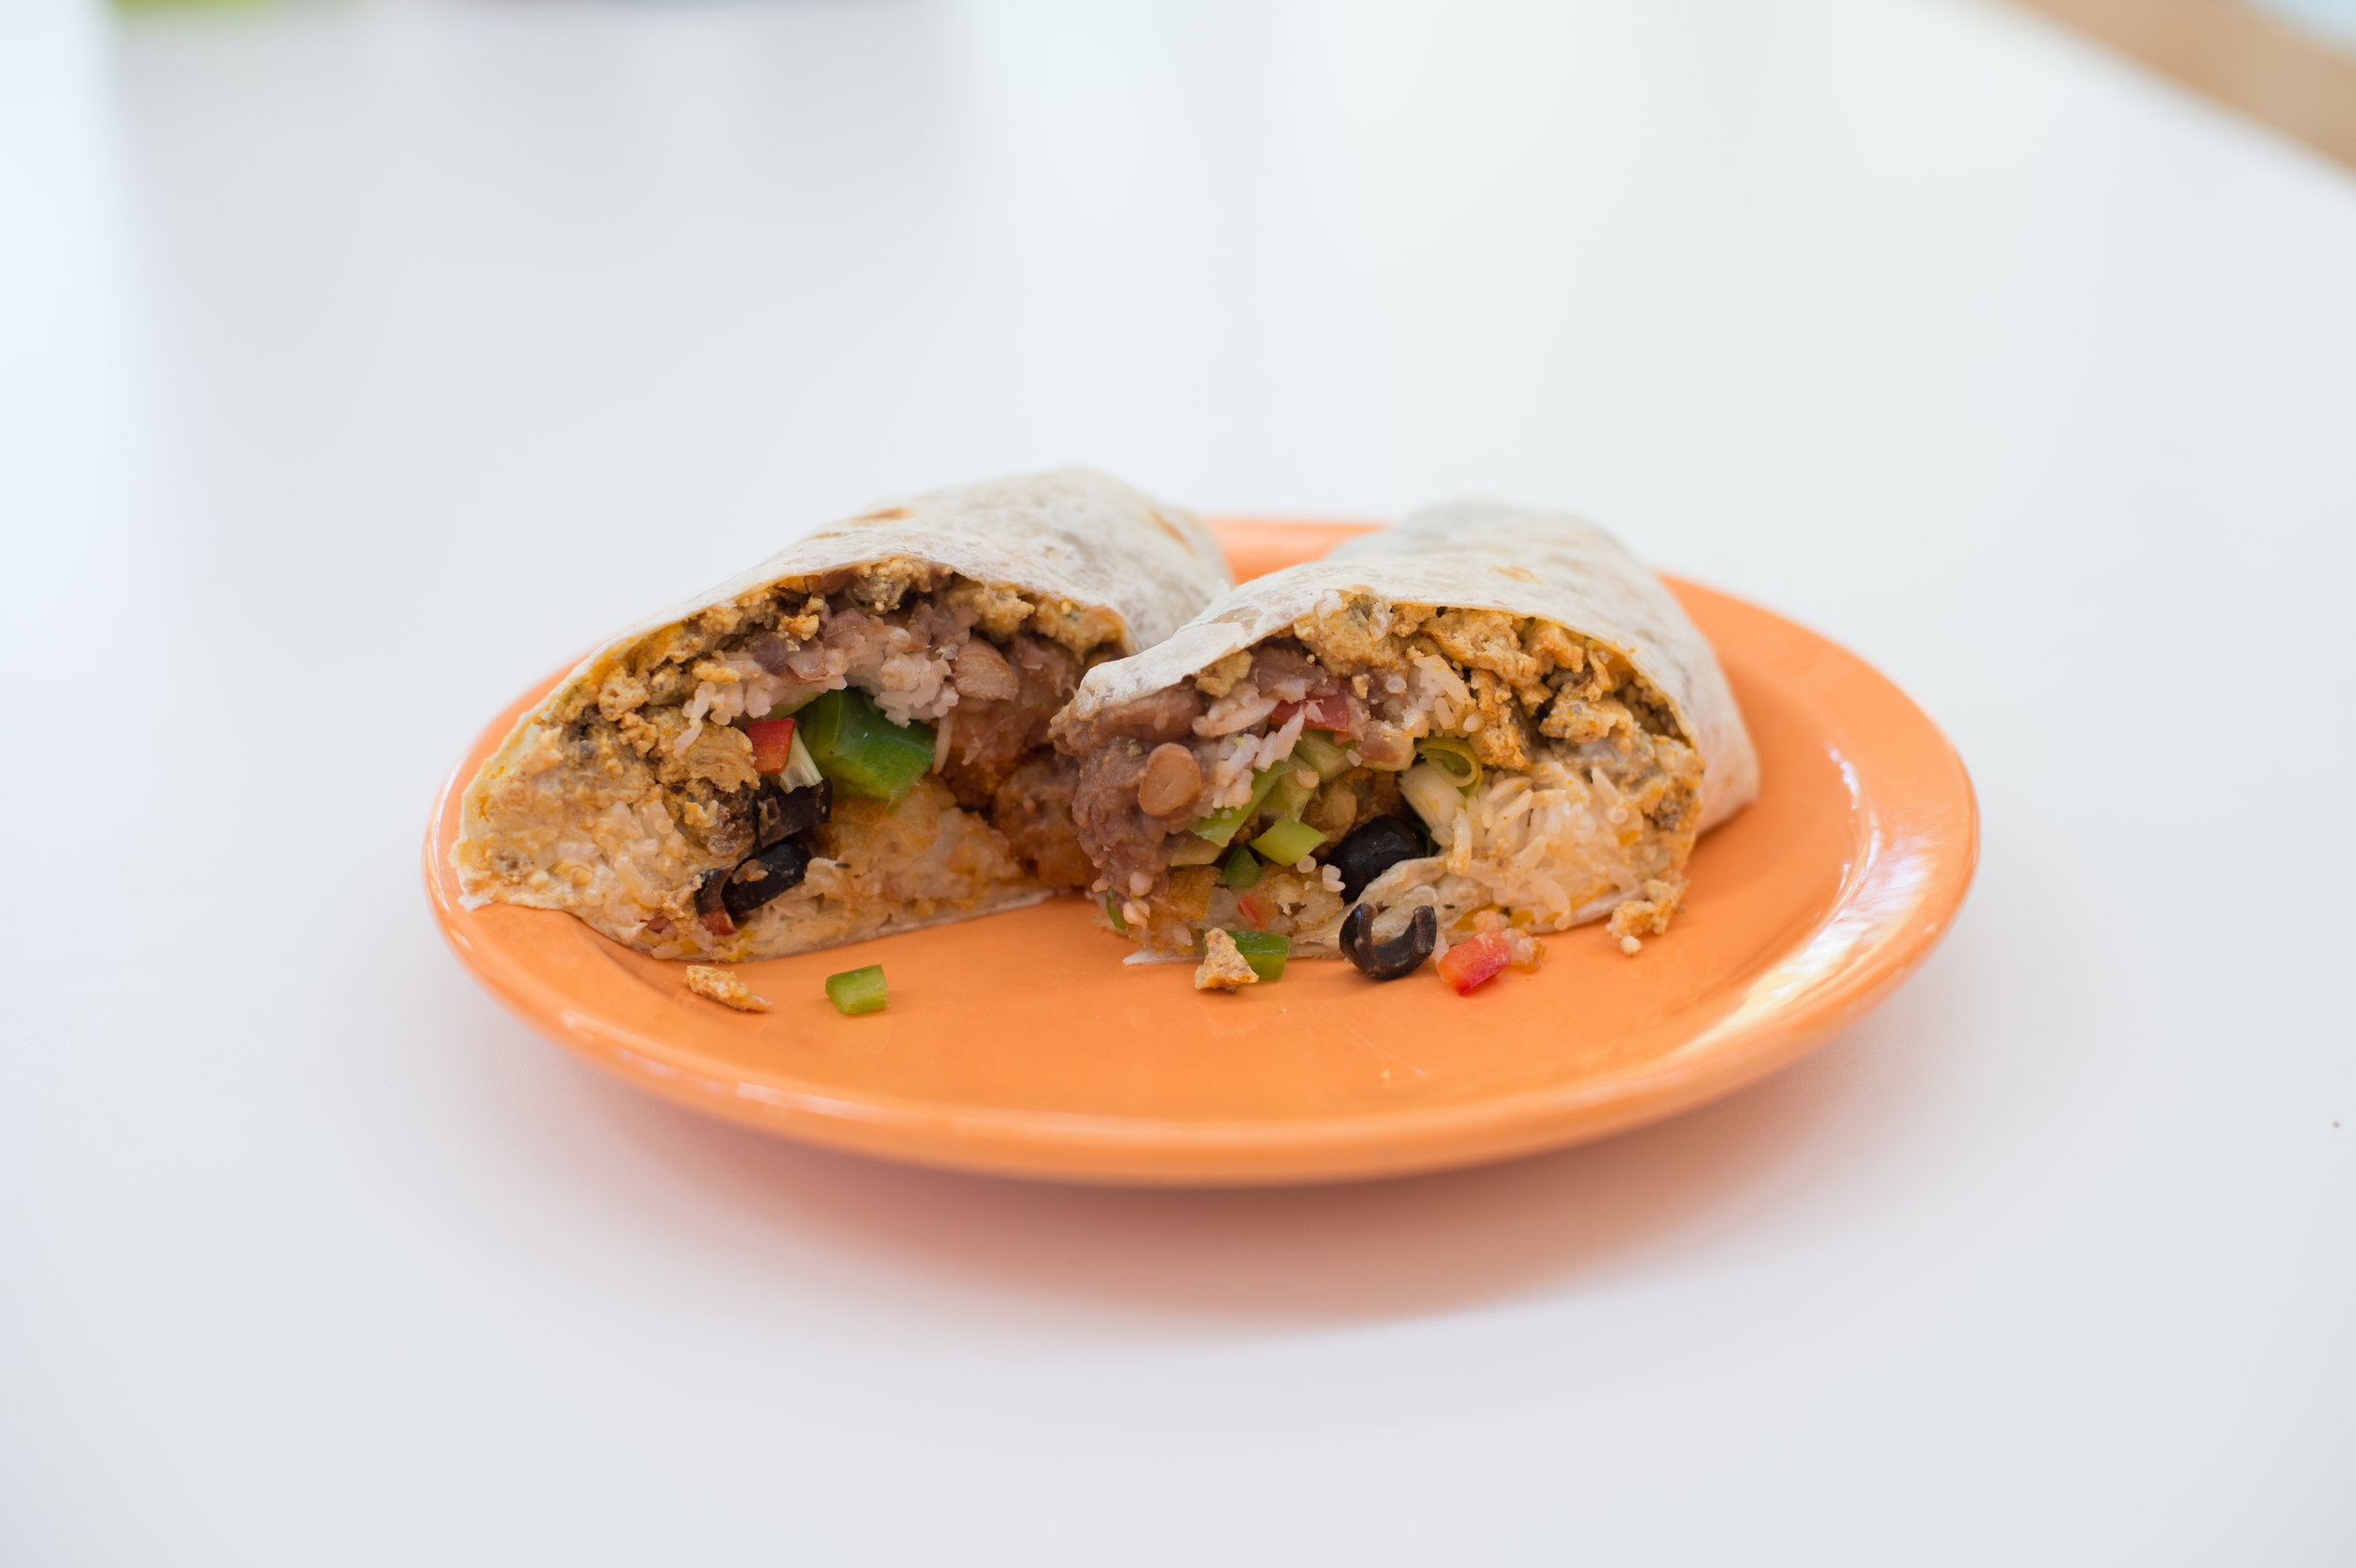 RS37963_Breakfast Burrito3.jpg